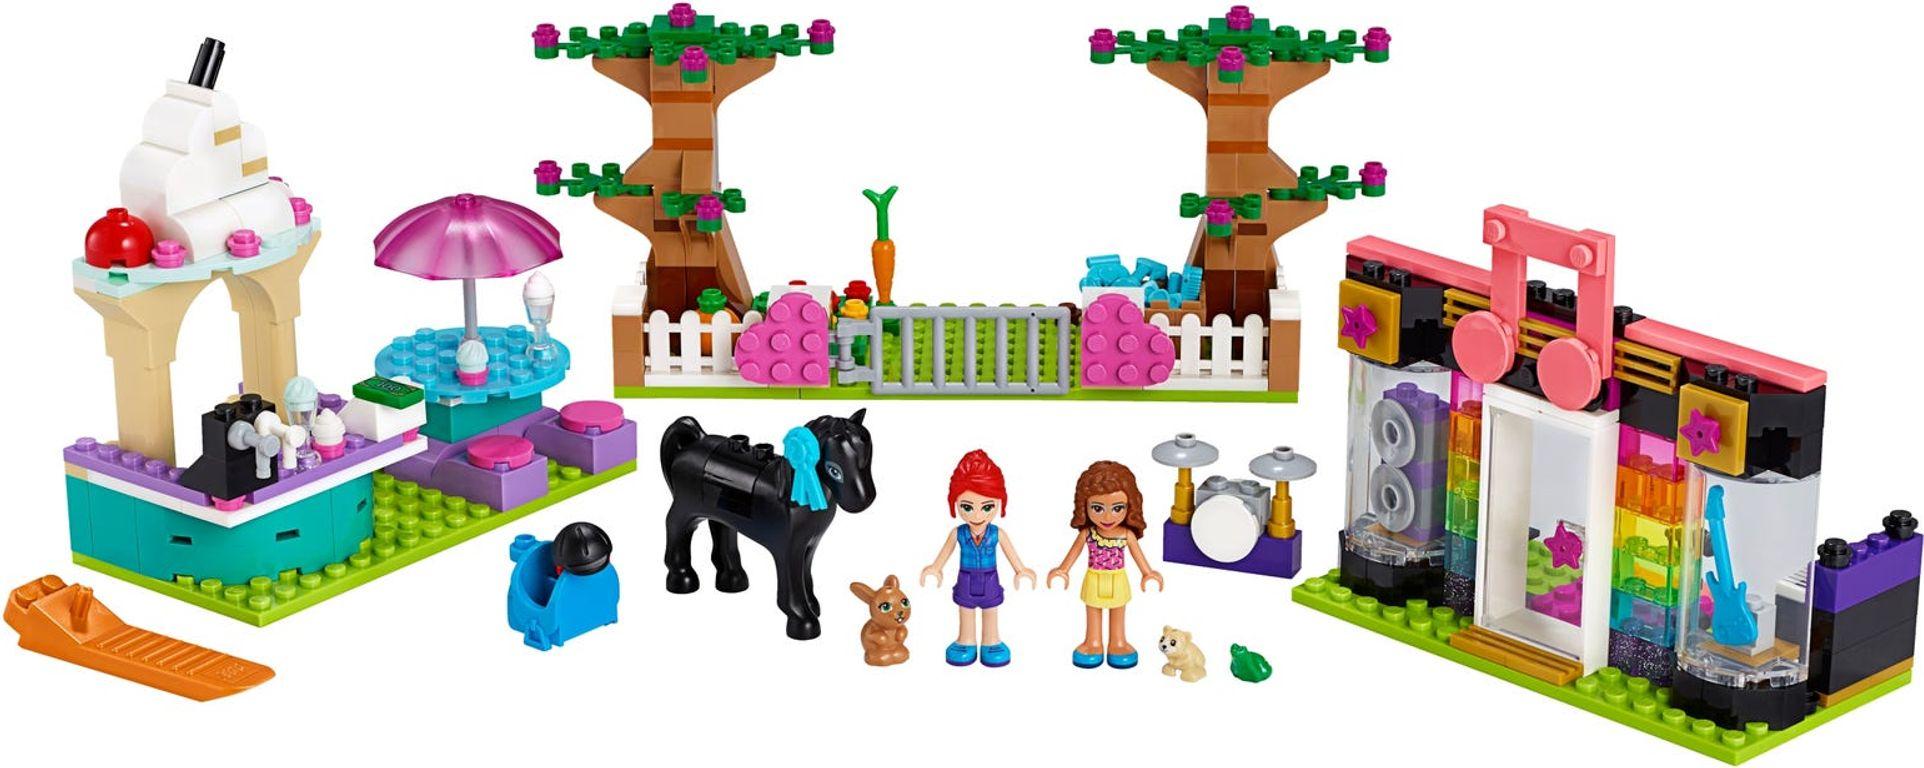 Heartlake City Brick Box components